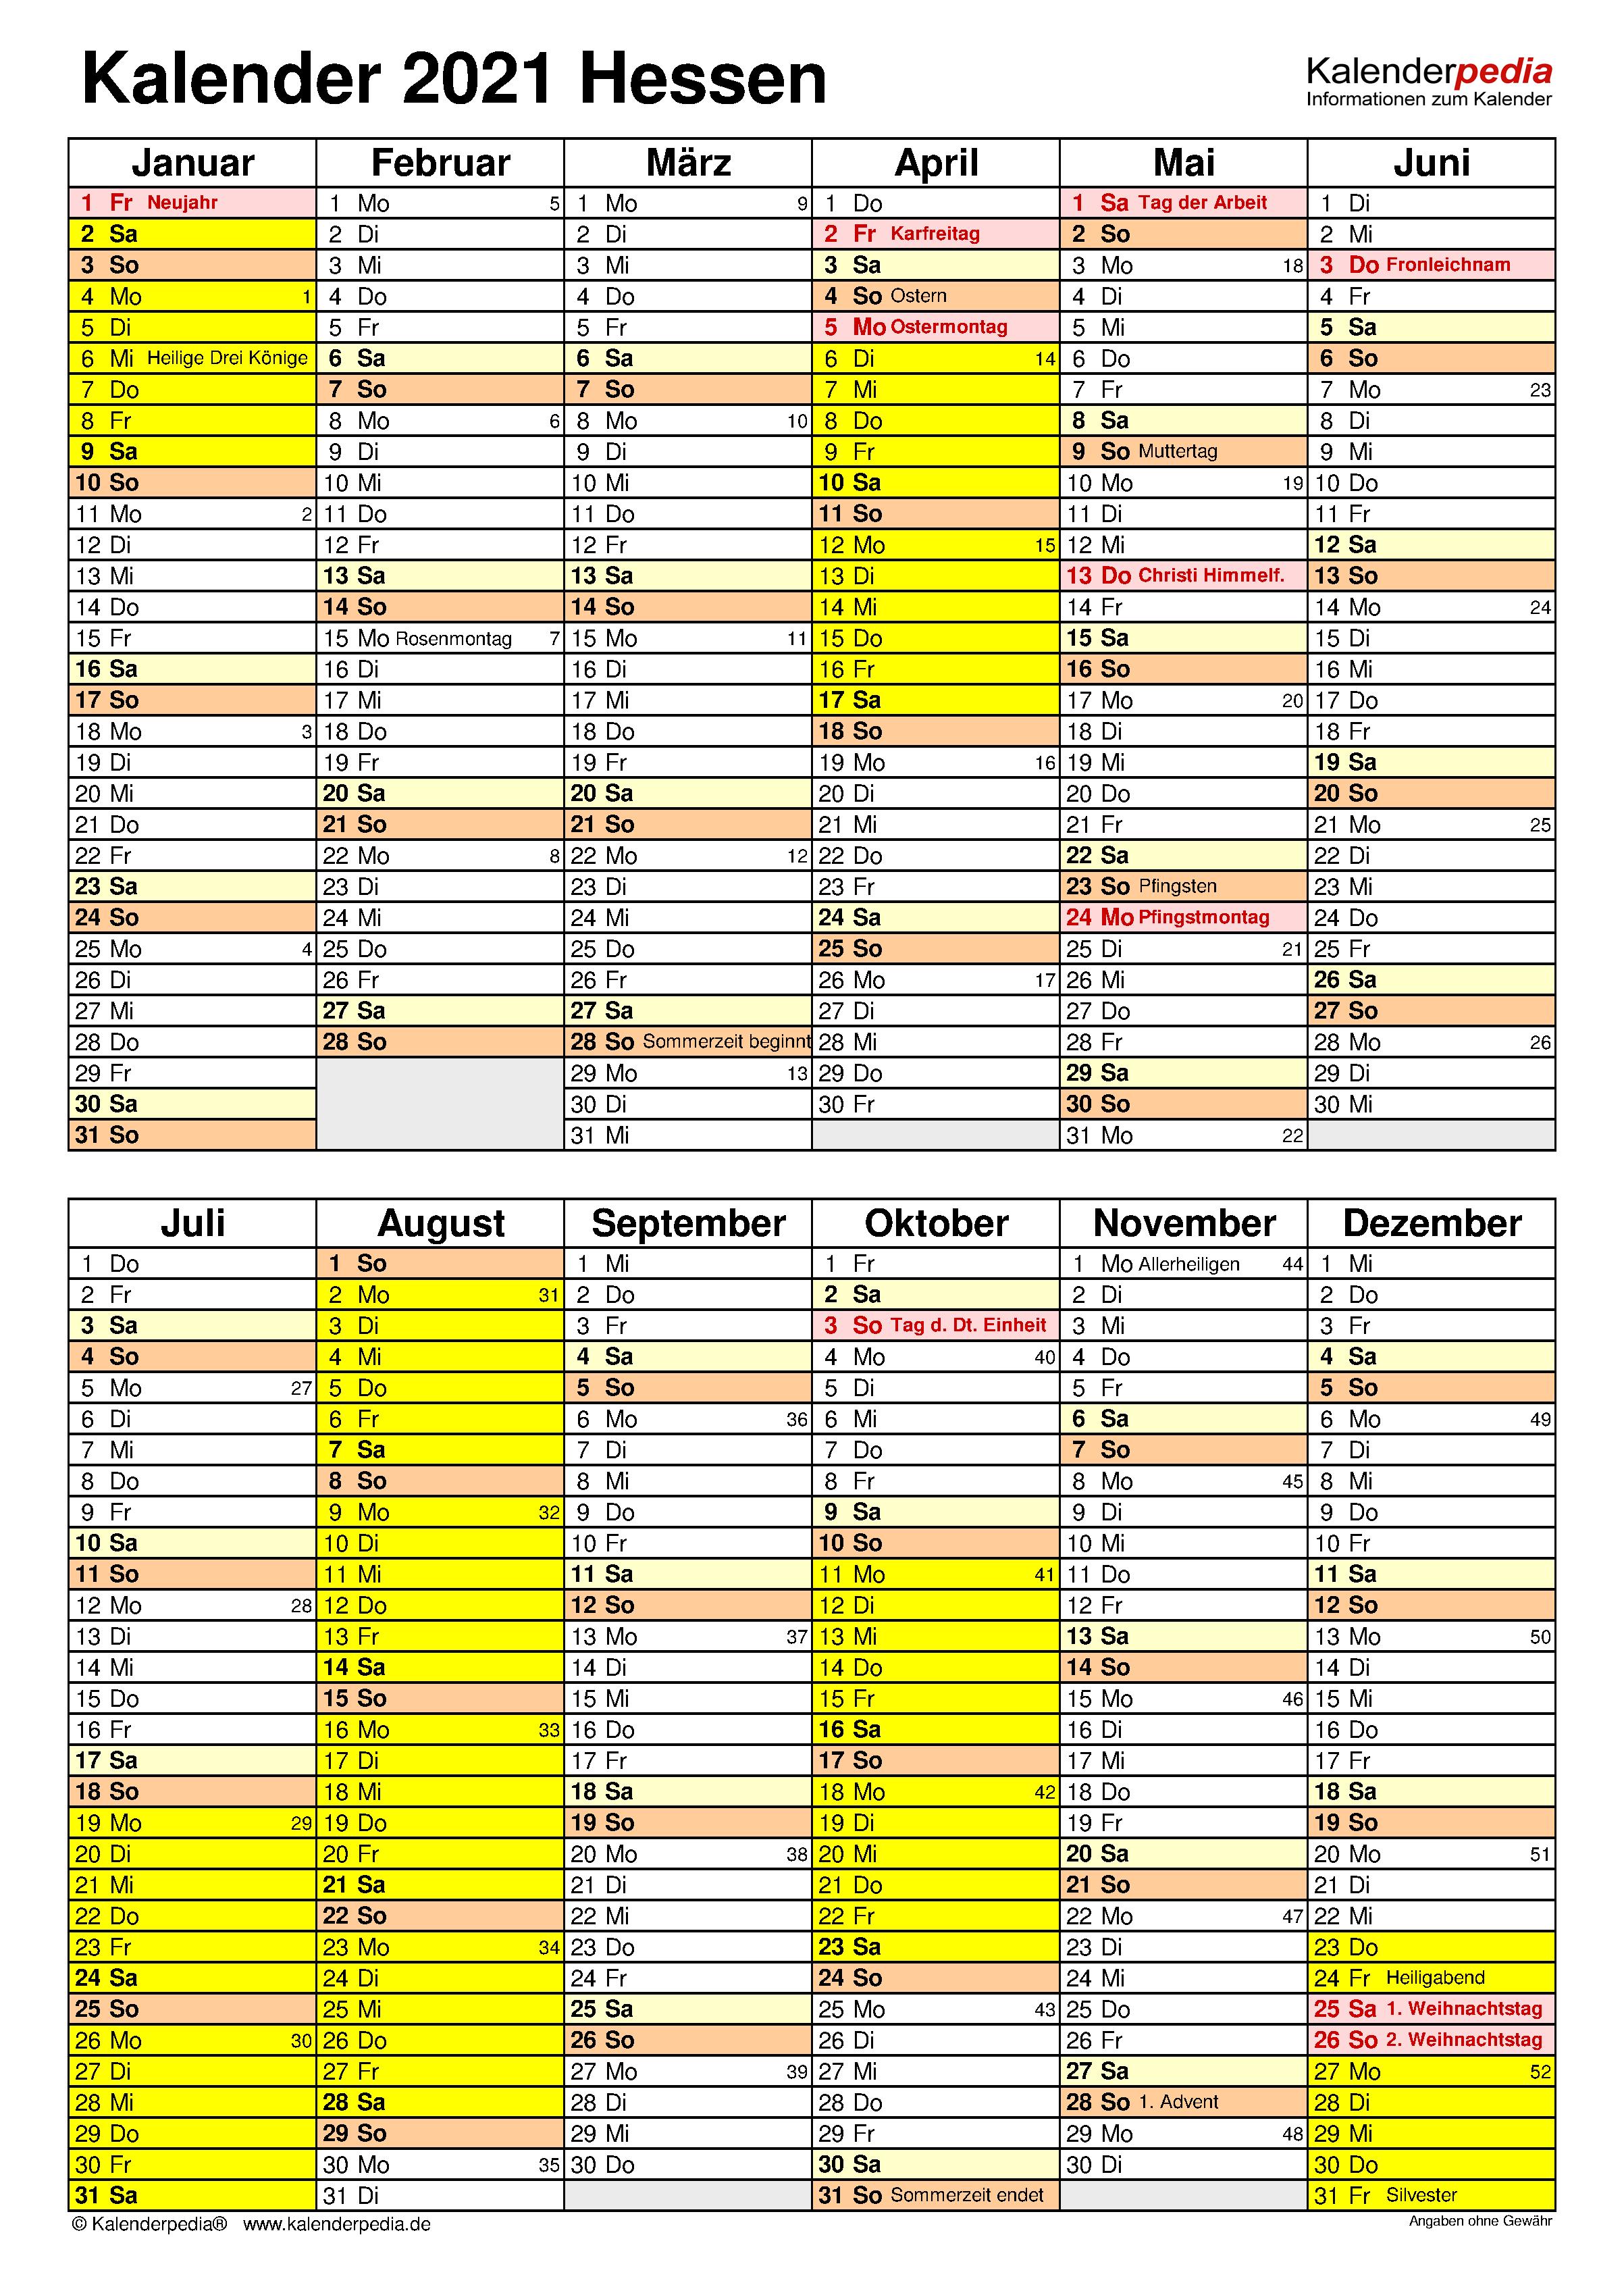 Hessen Kalender 2021